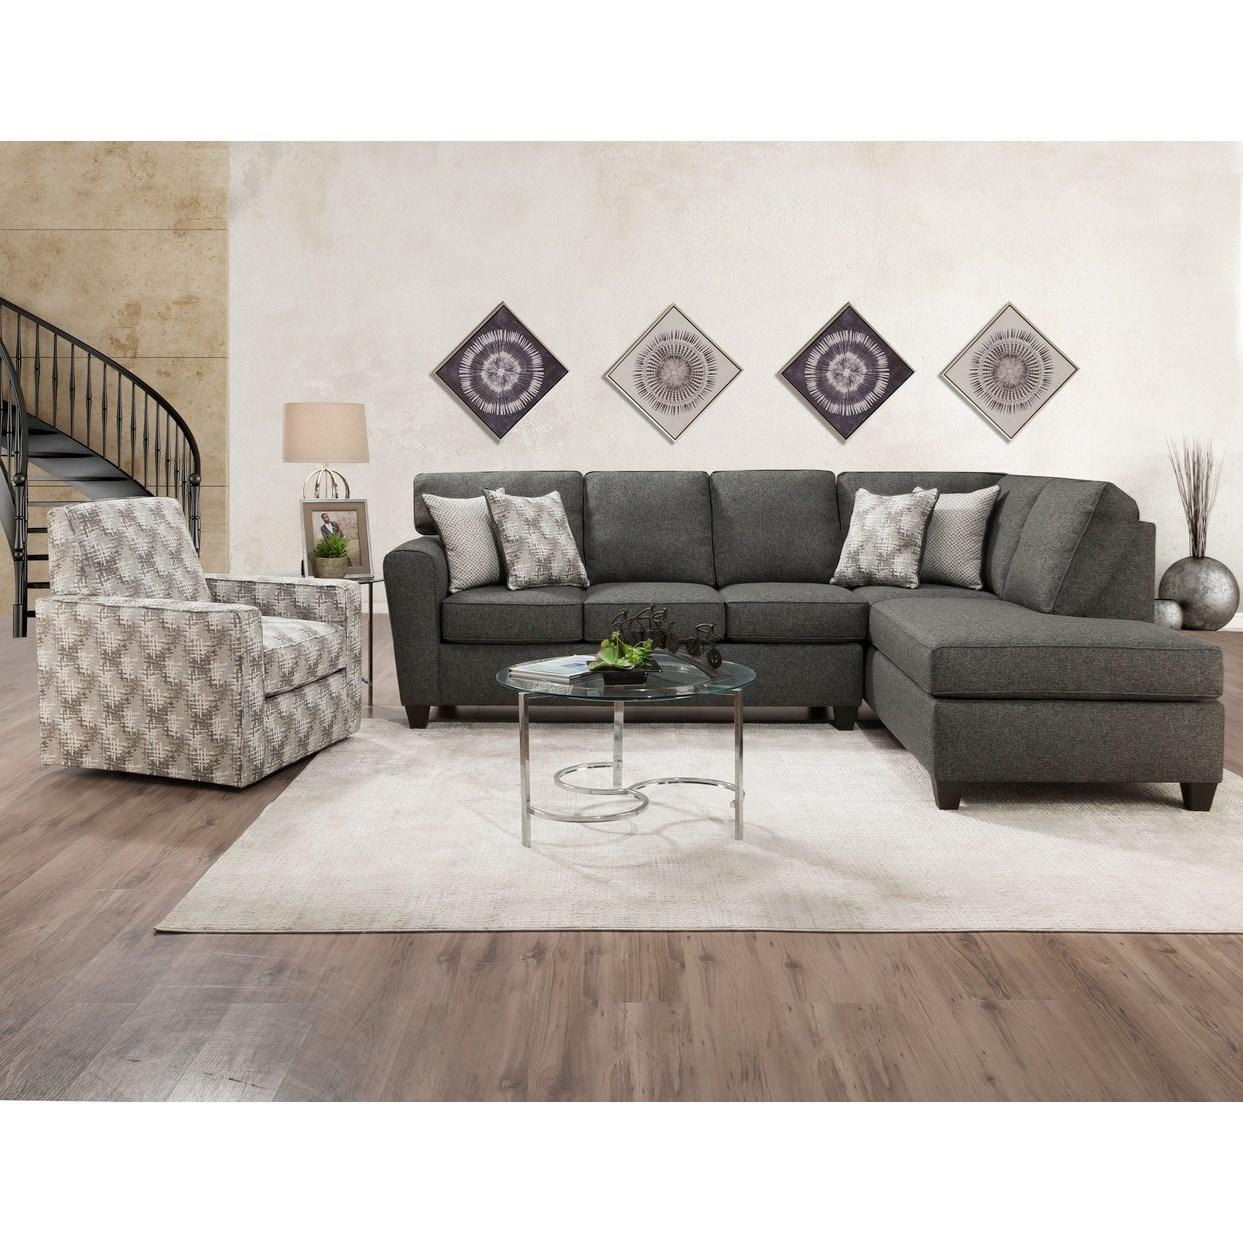 3100 Living Room Group by Vendor 610 at Becker Furniture